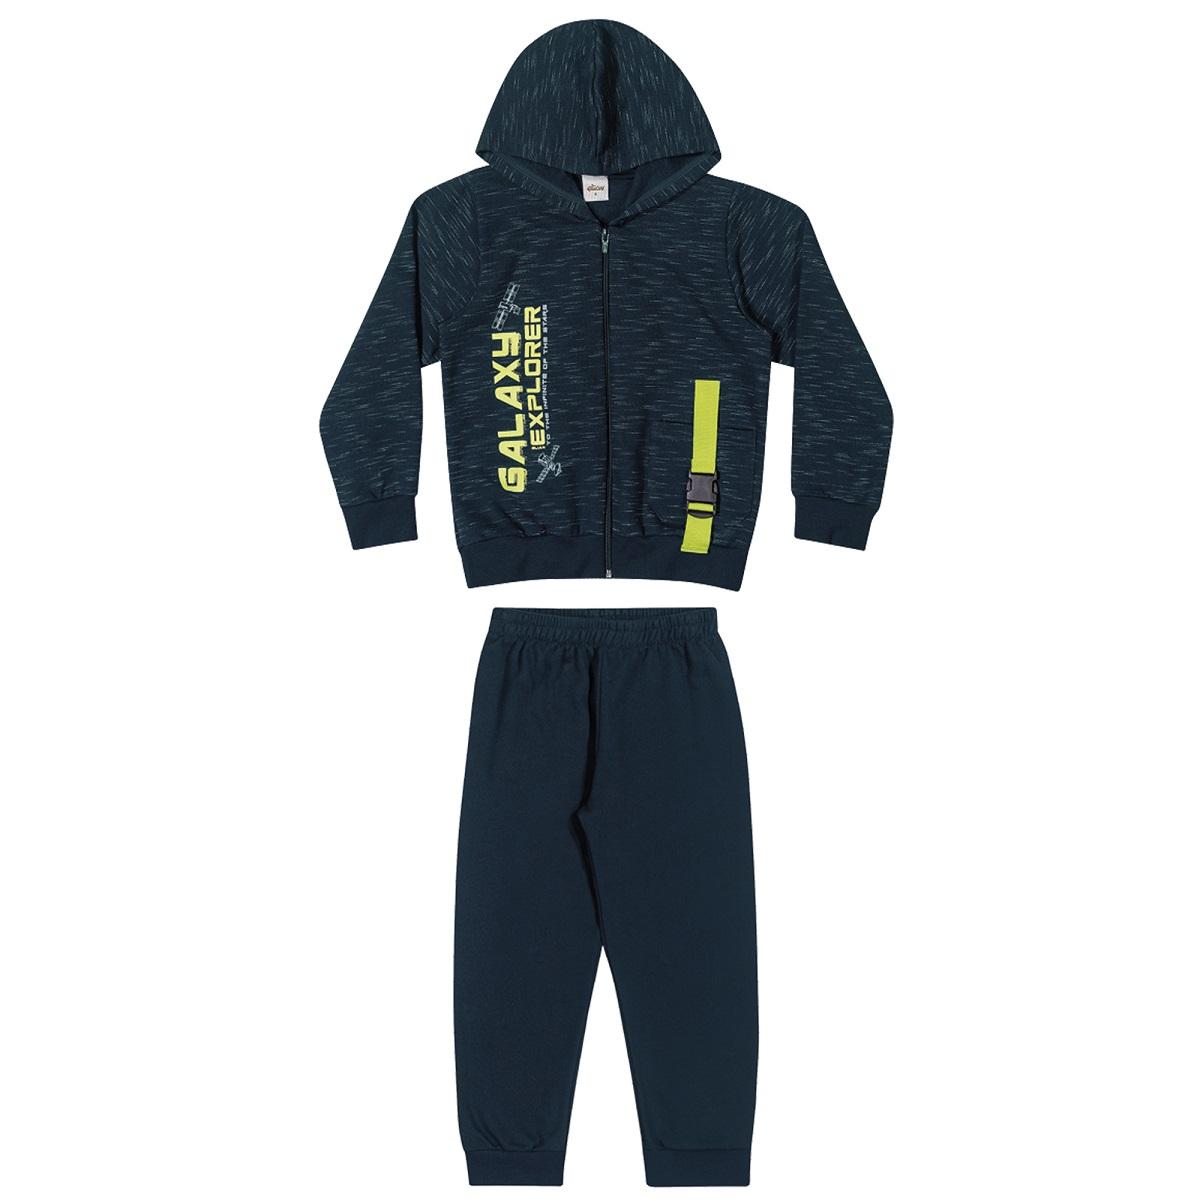 Conjunto Infantil Masculino Jaqueta e Calça - ELIAN 241041